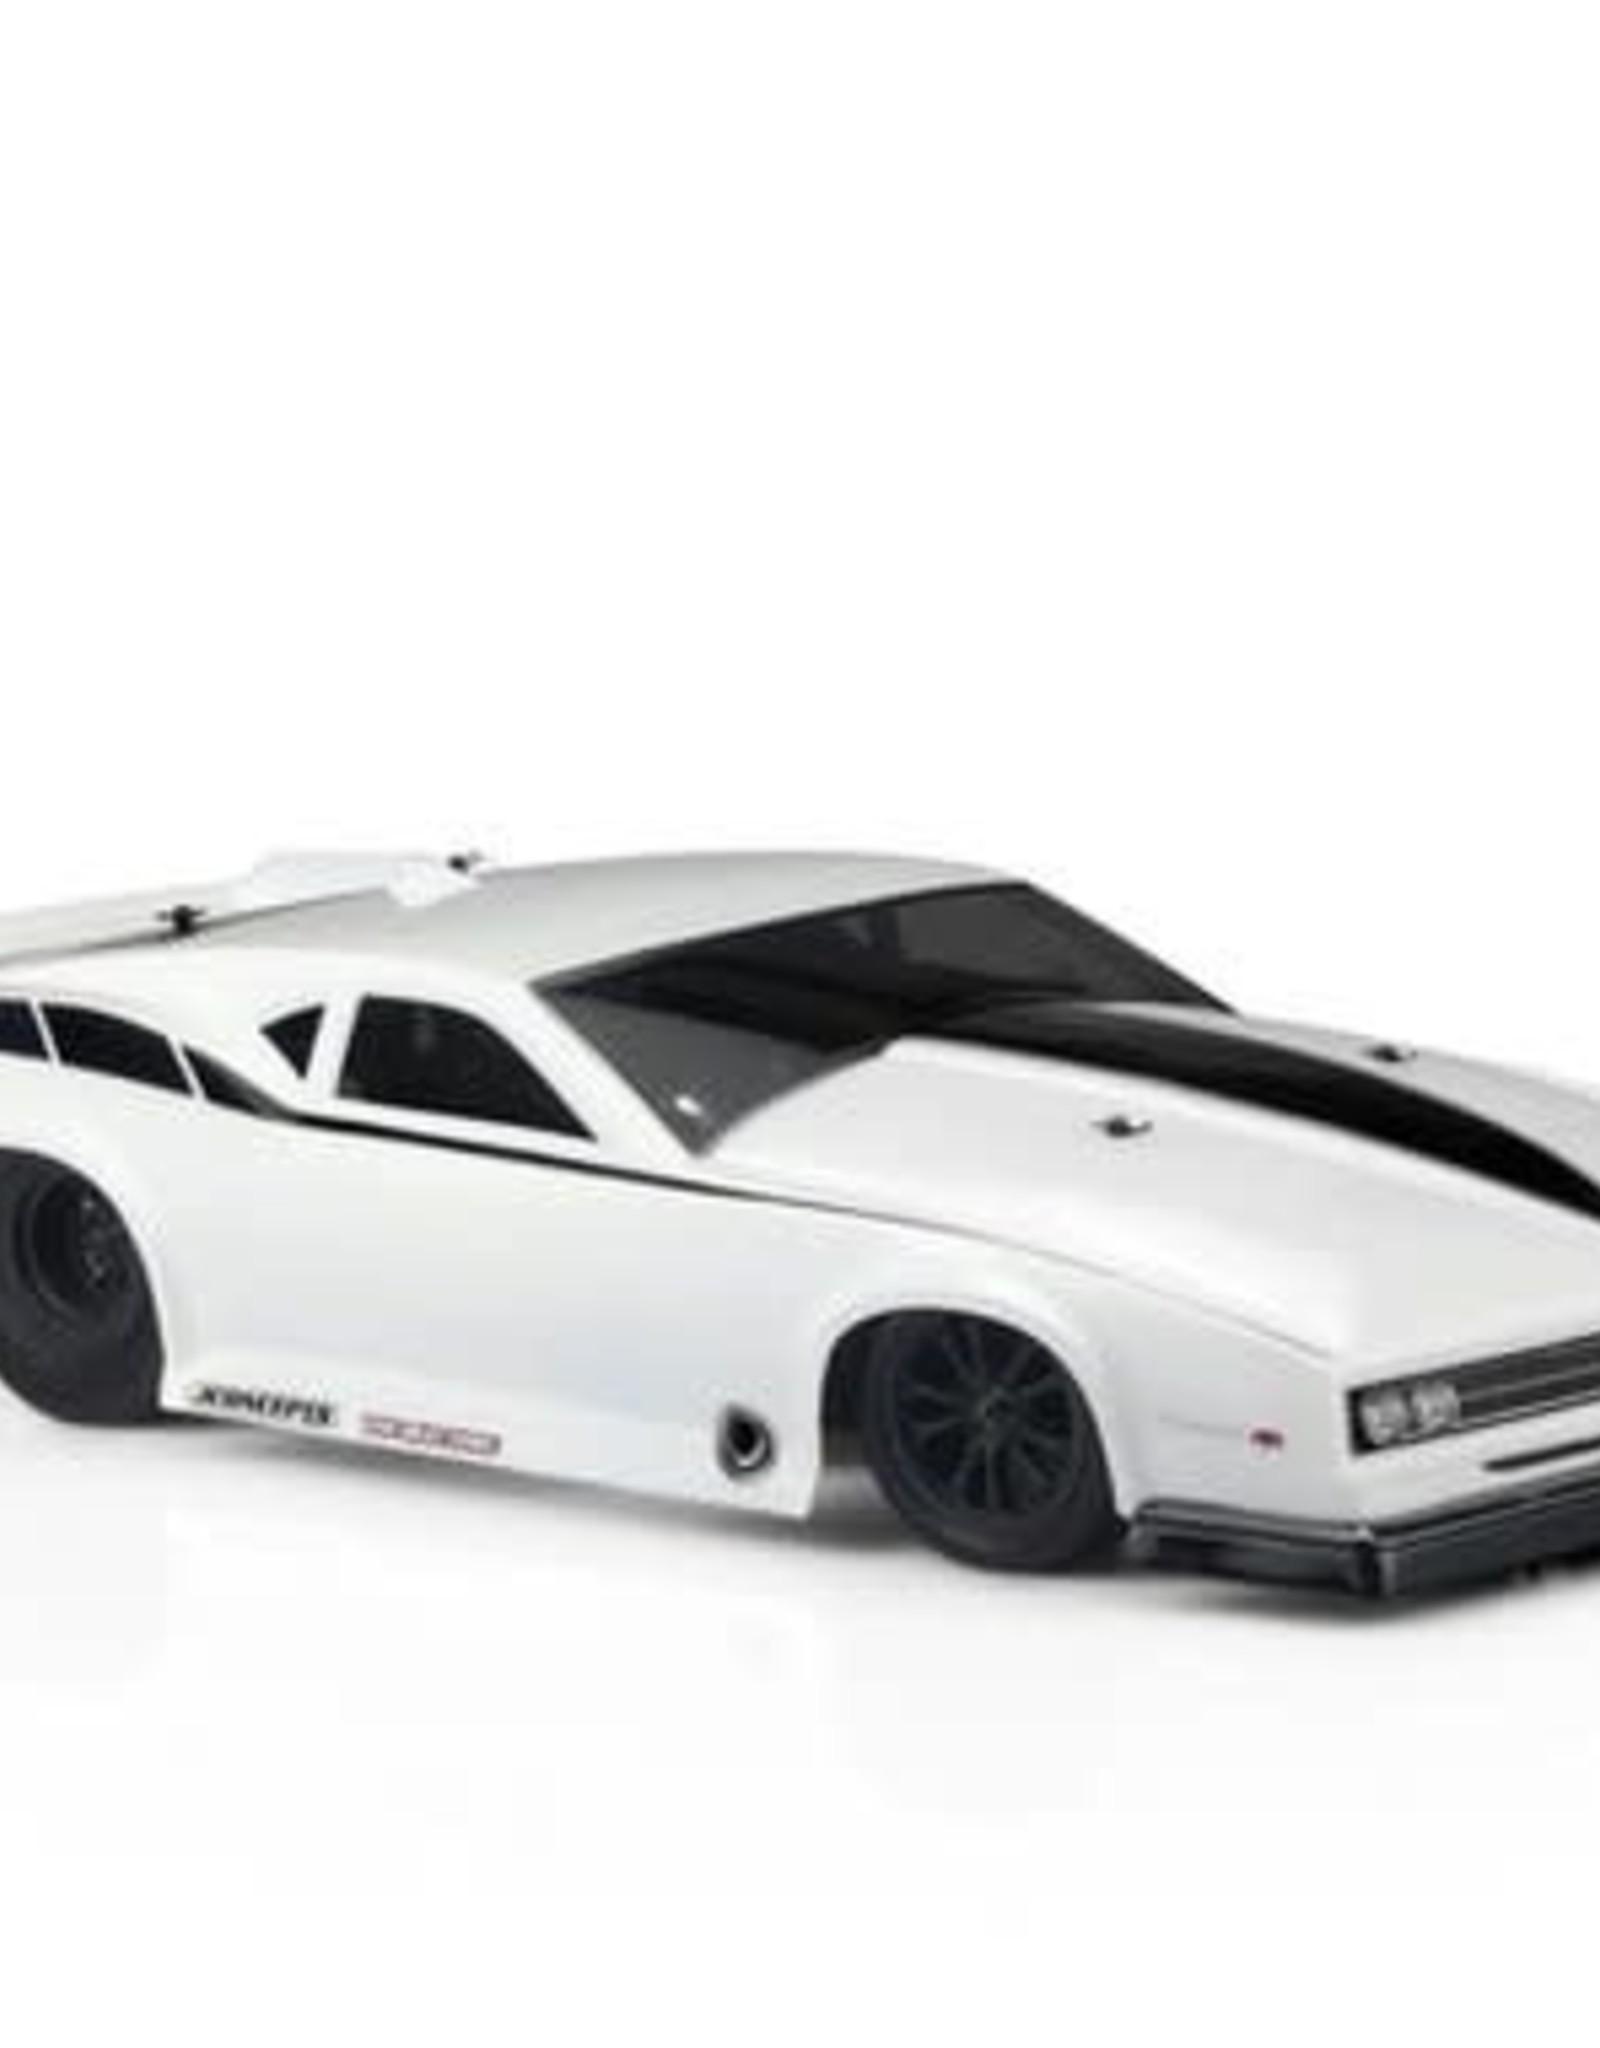 "JConcepts JConcepts ""The Machine"" 1968 Pontiac Firebird Pro 1/10 Drag Racing Body (Clear)"